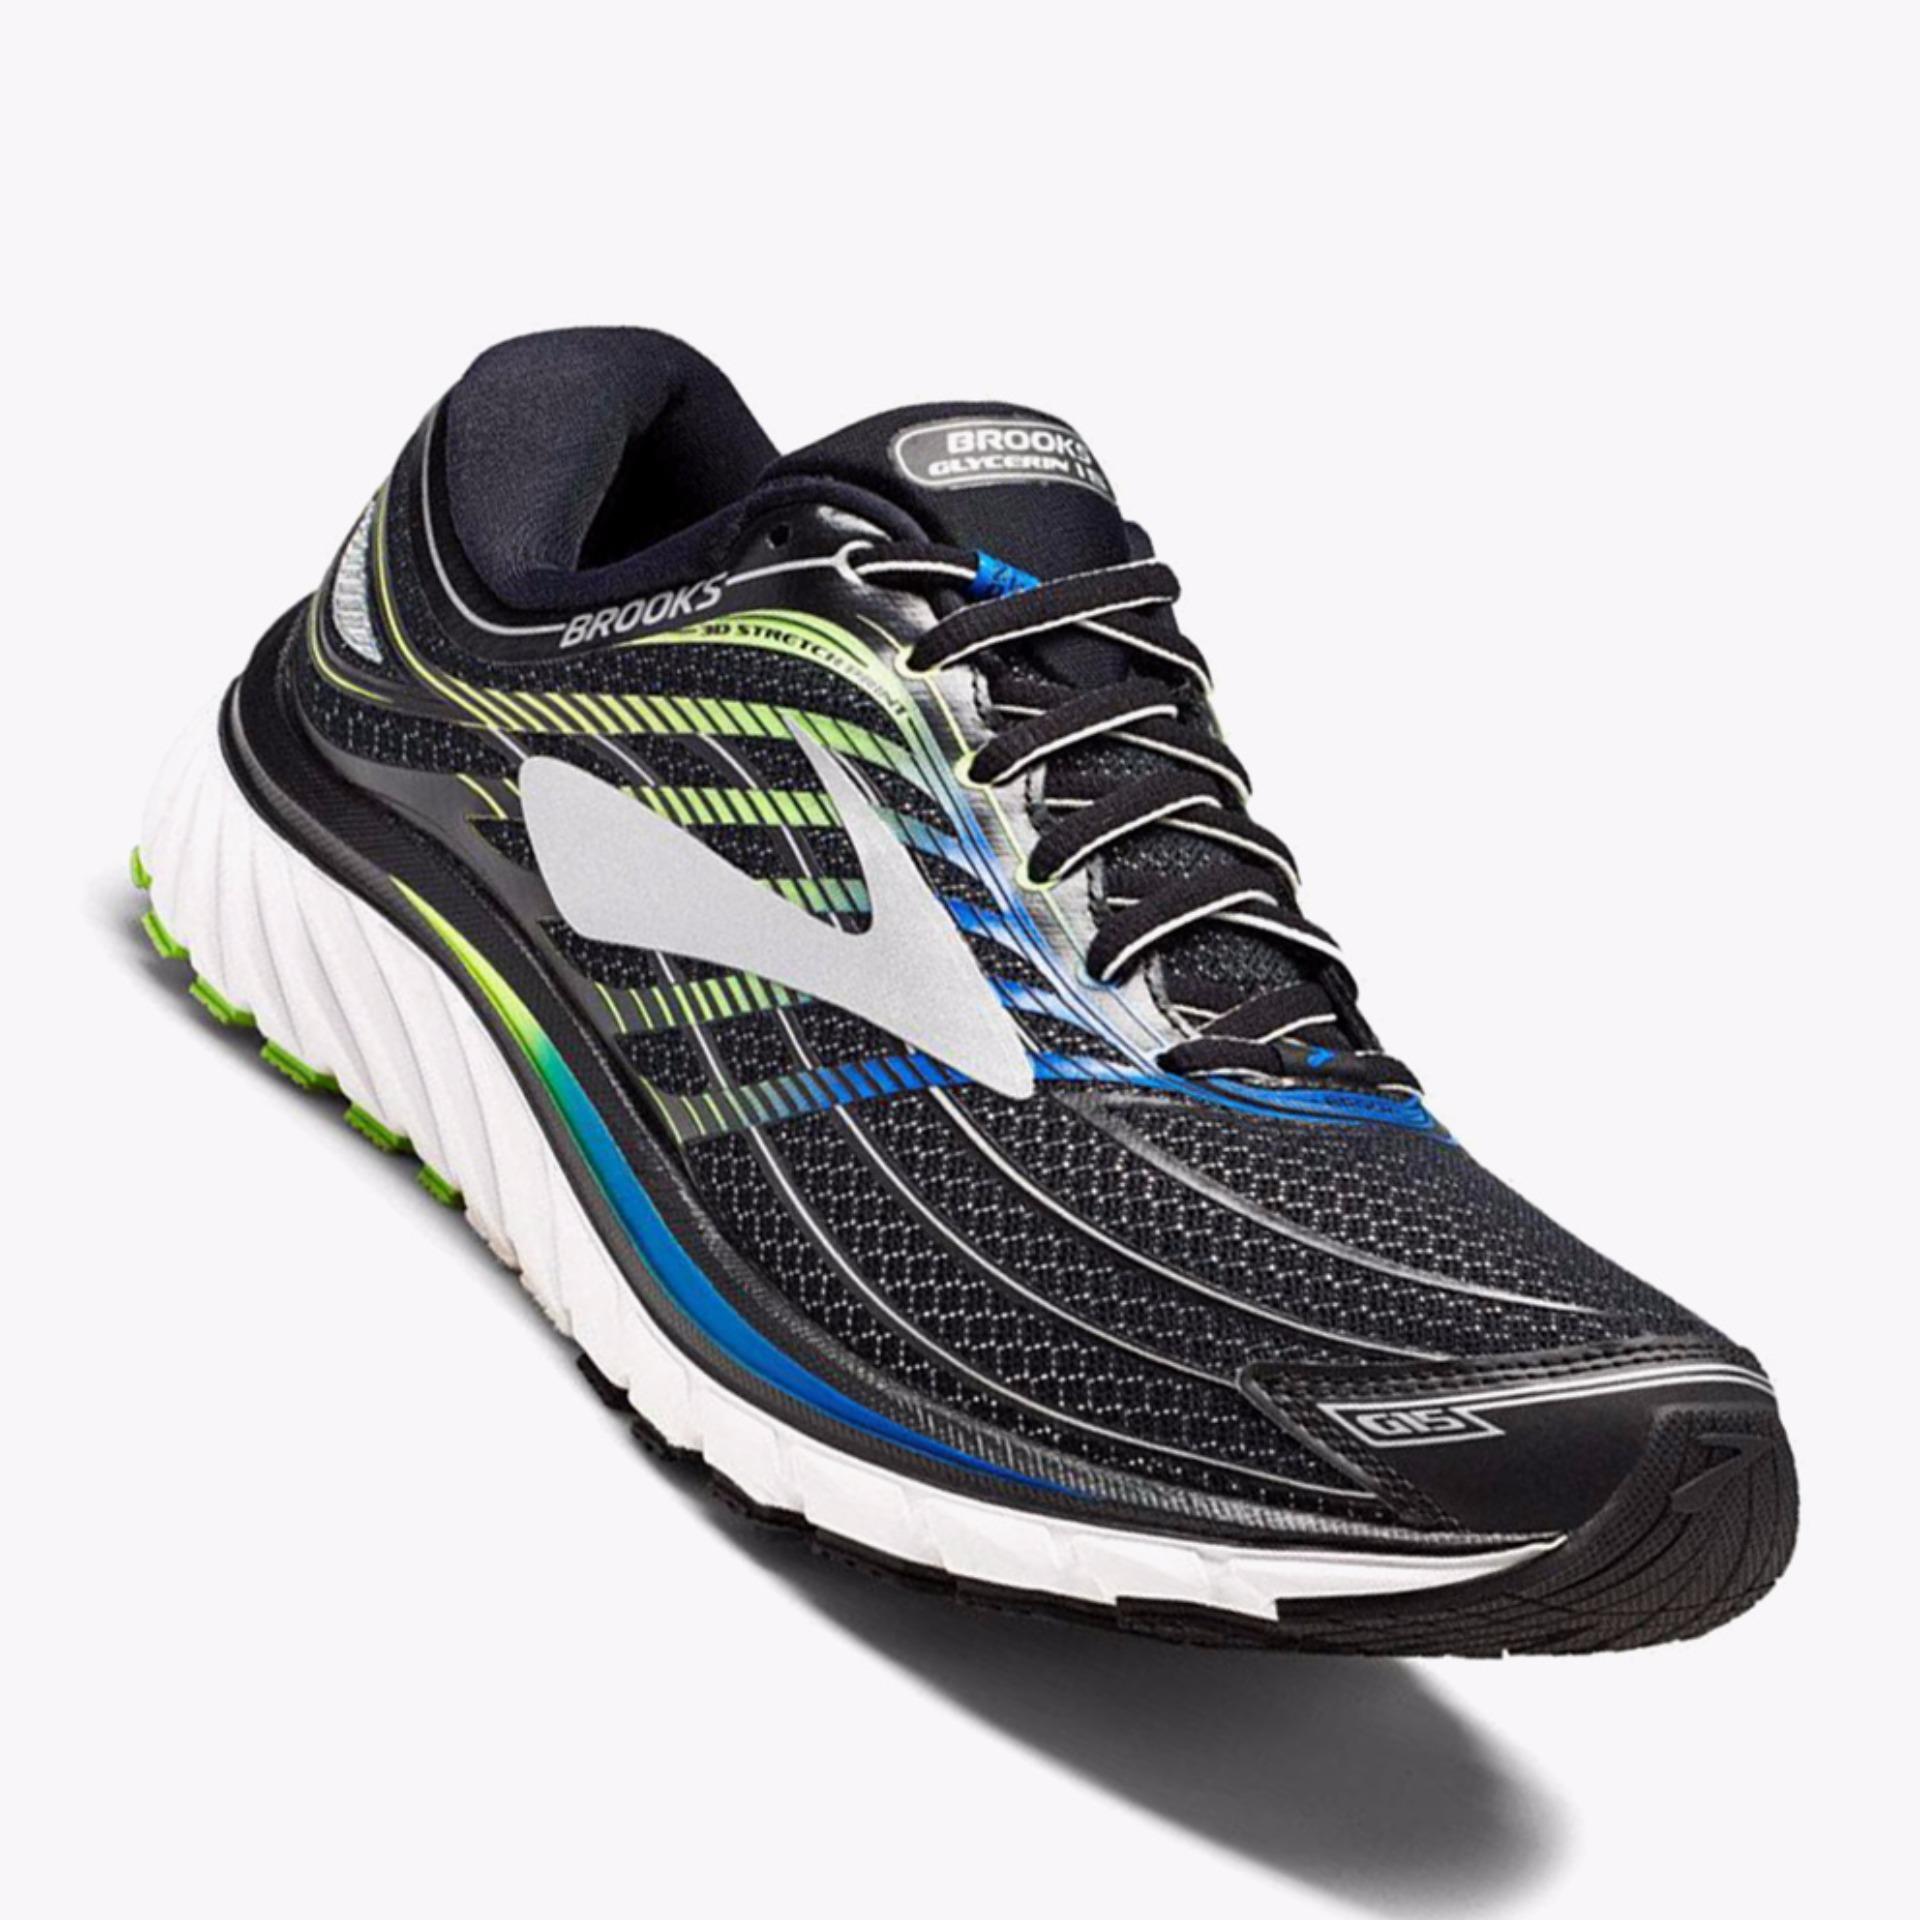 Brooks Glycerin 15 Men's Running Shoes - Normal D - Hitam